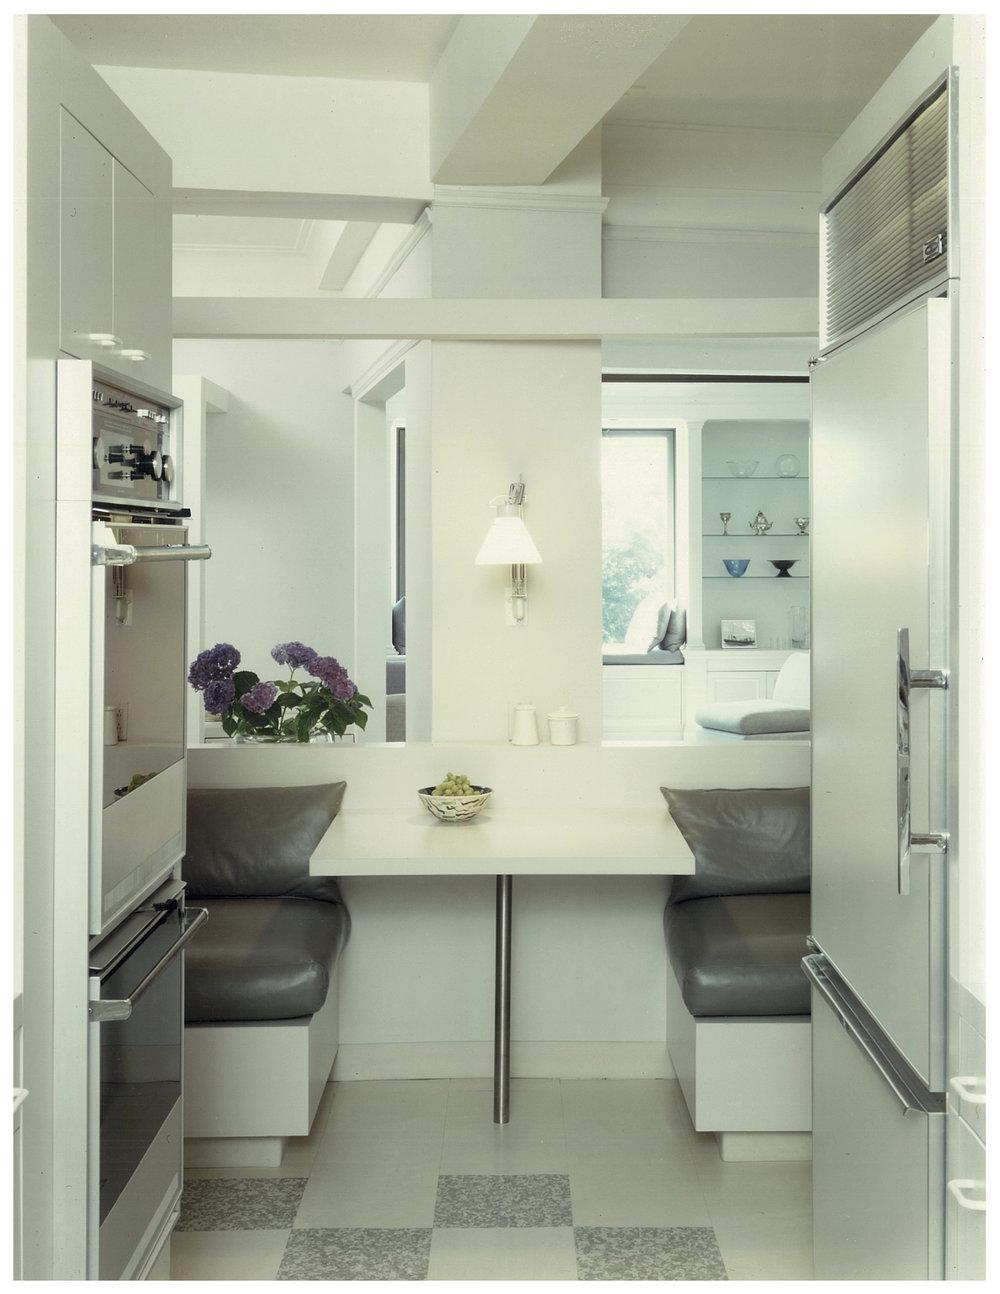 Stossel Apt- Photo Kitchen copy.jpg